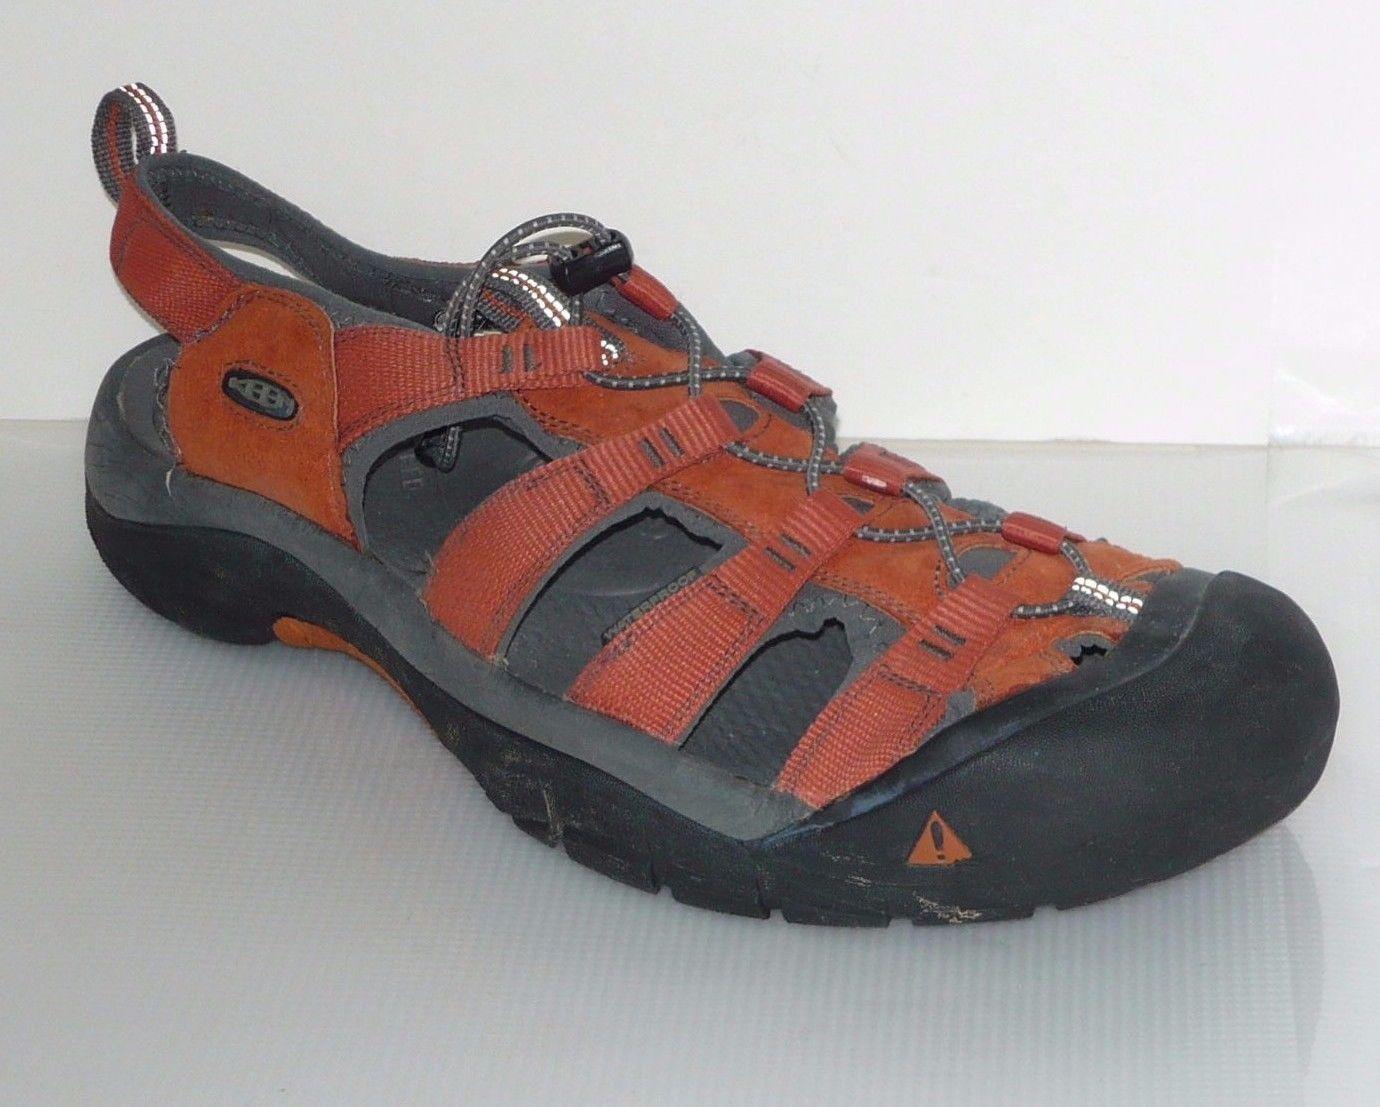 Genuine Keen Orange Leather Men's Sandal Sz 17